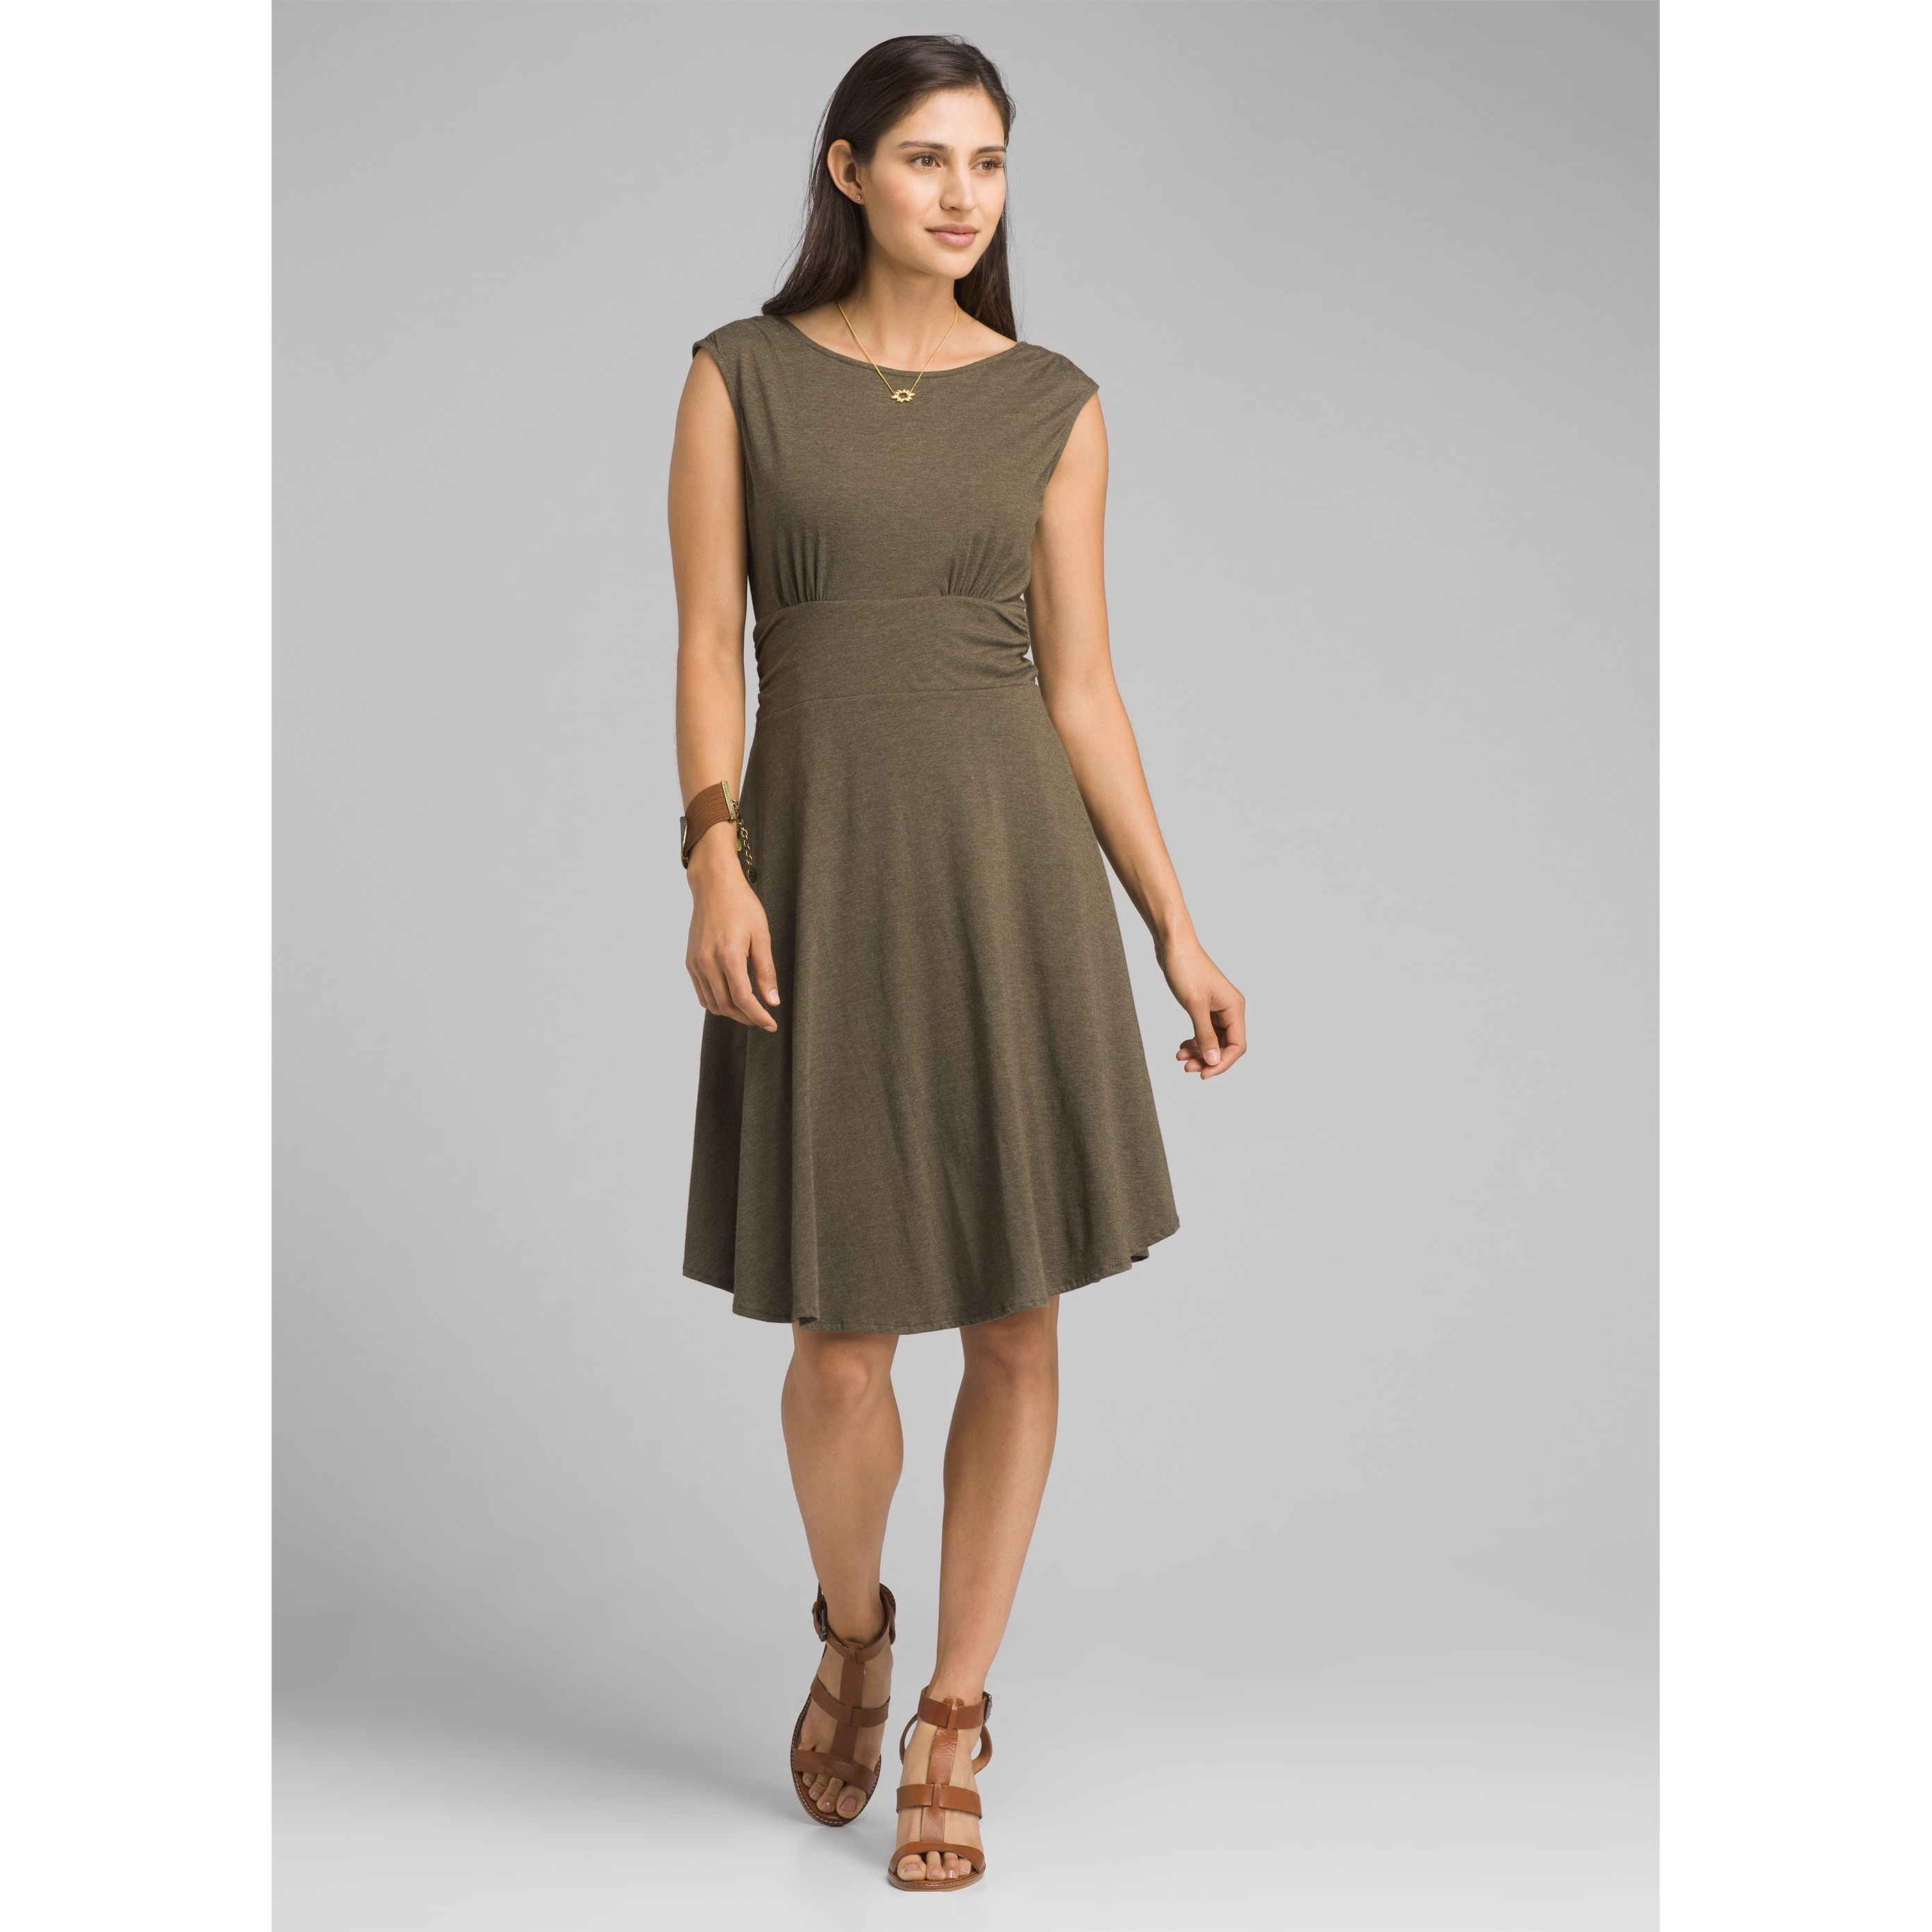 Jola Dress - Women's